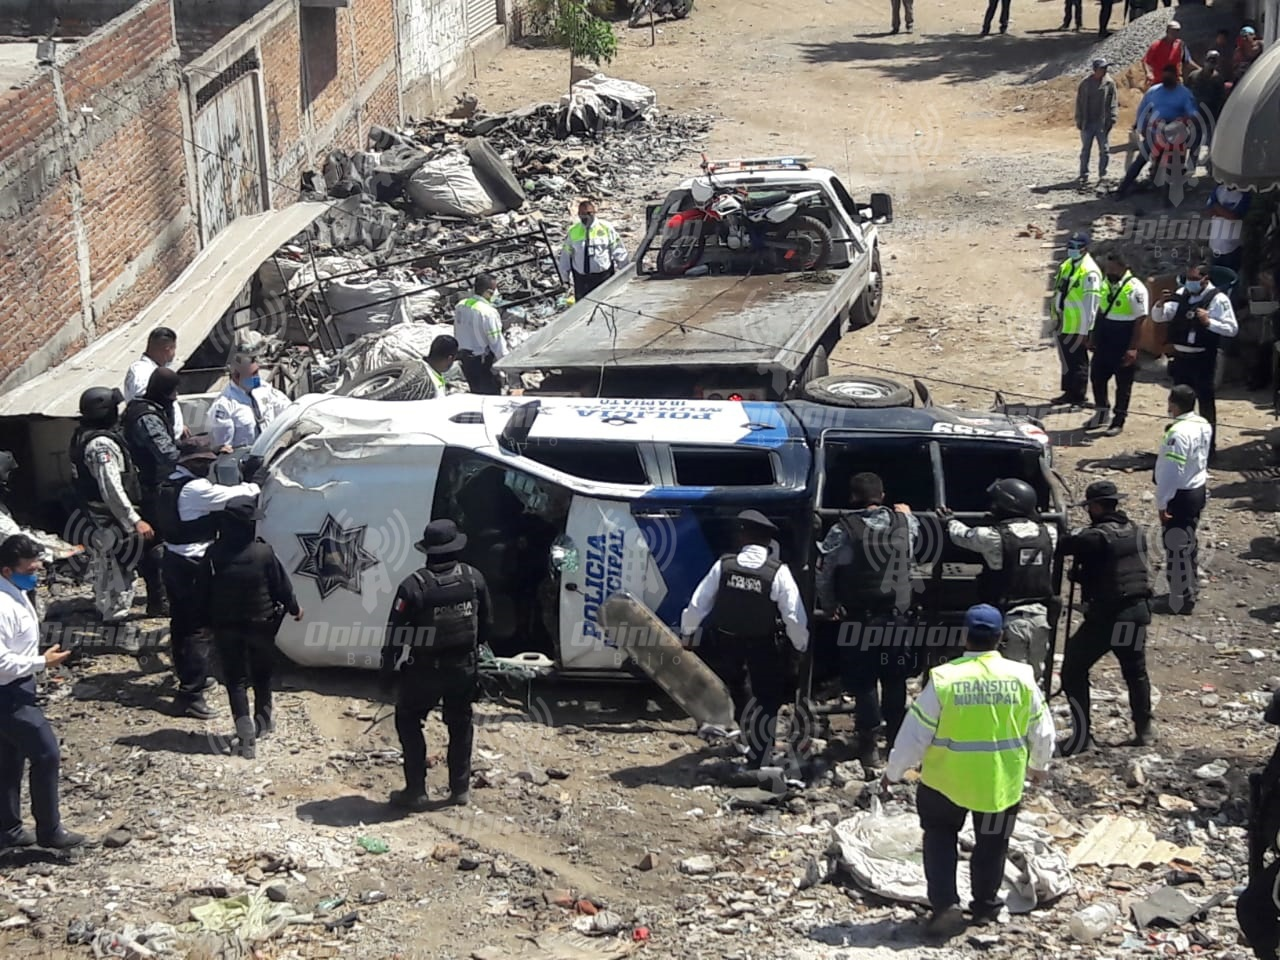 Patrulla de la Policía Municipal se vuelca en trébol de salida a Abasolo